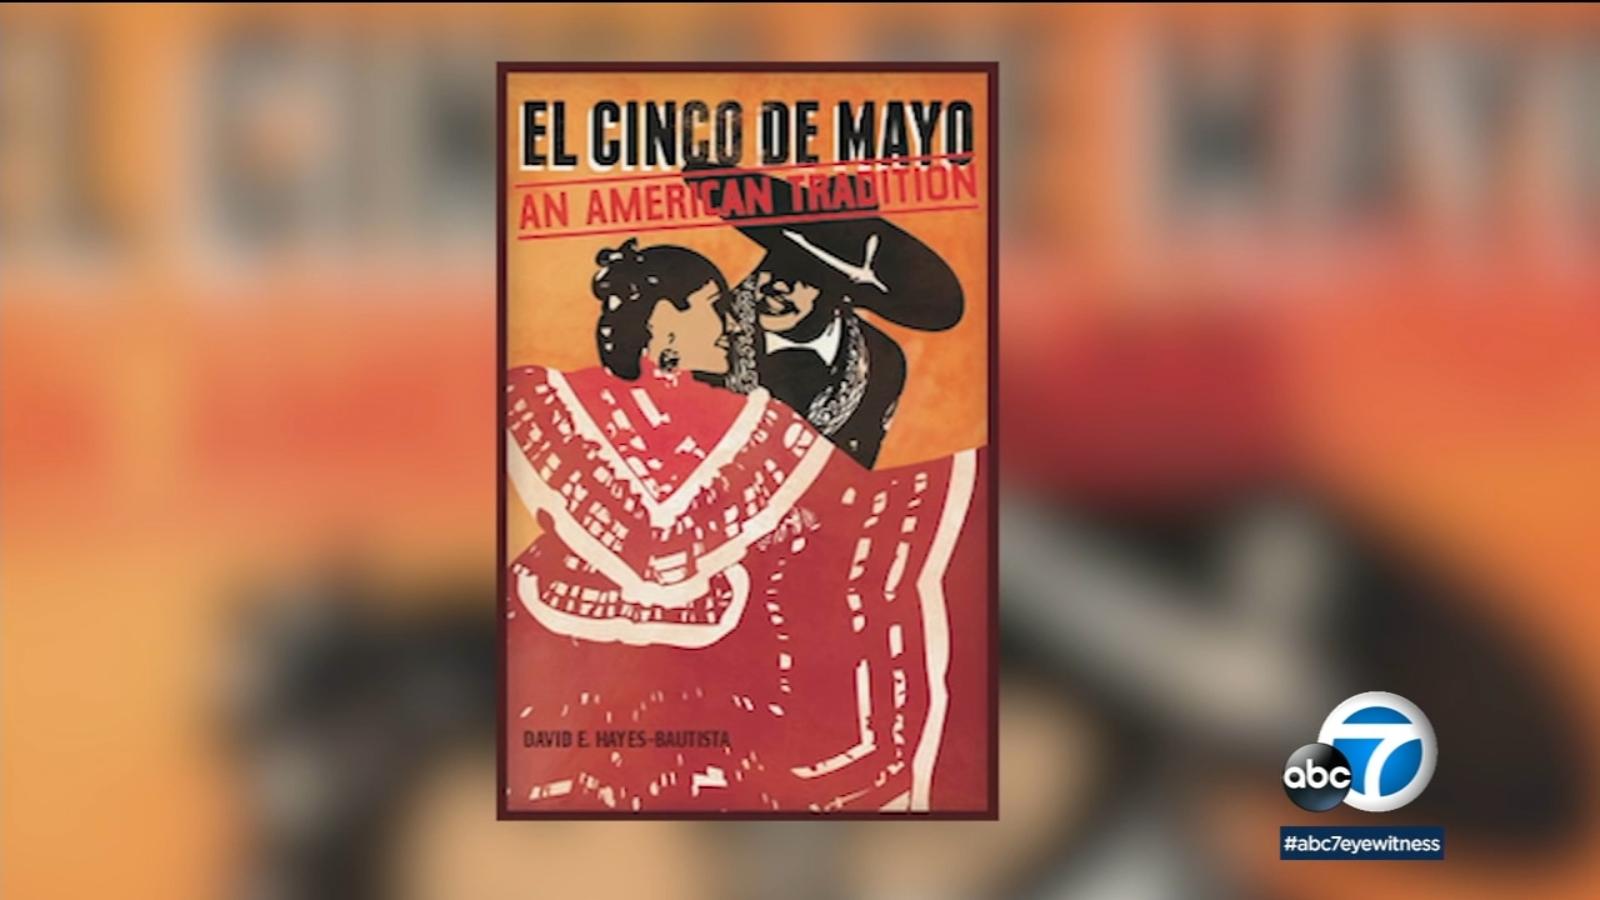 The origin of Cinco de Mayo Celebrations in the U.S. according to a UCLA scholar